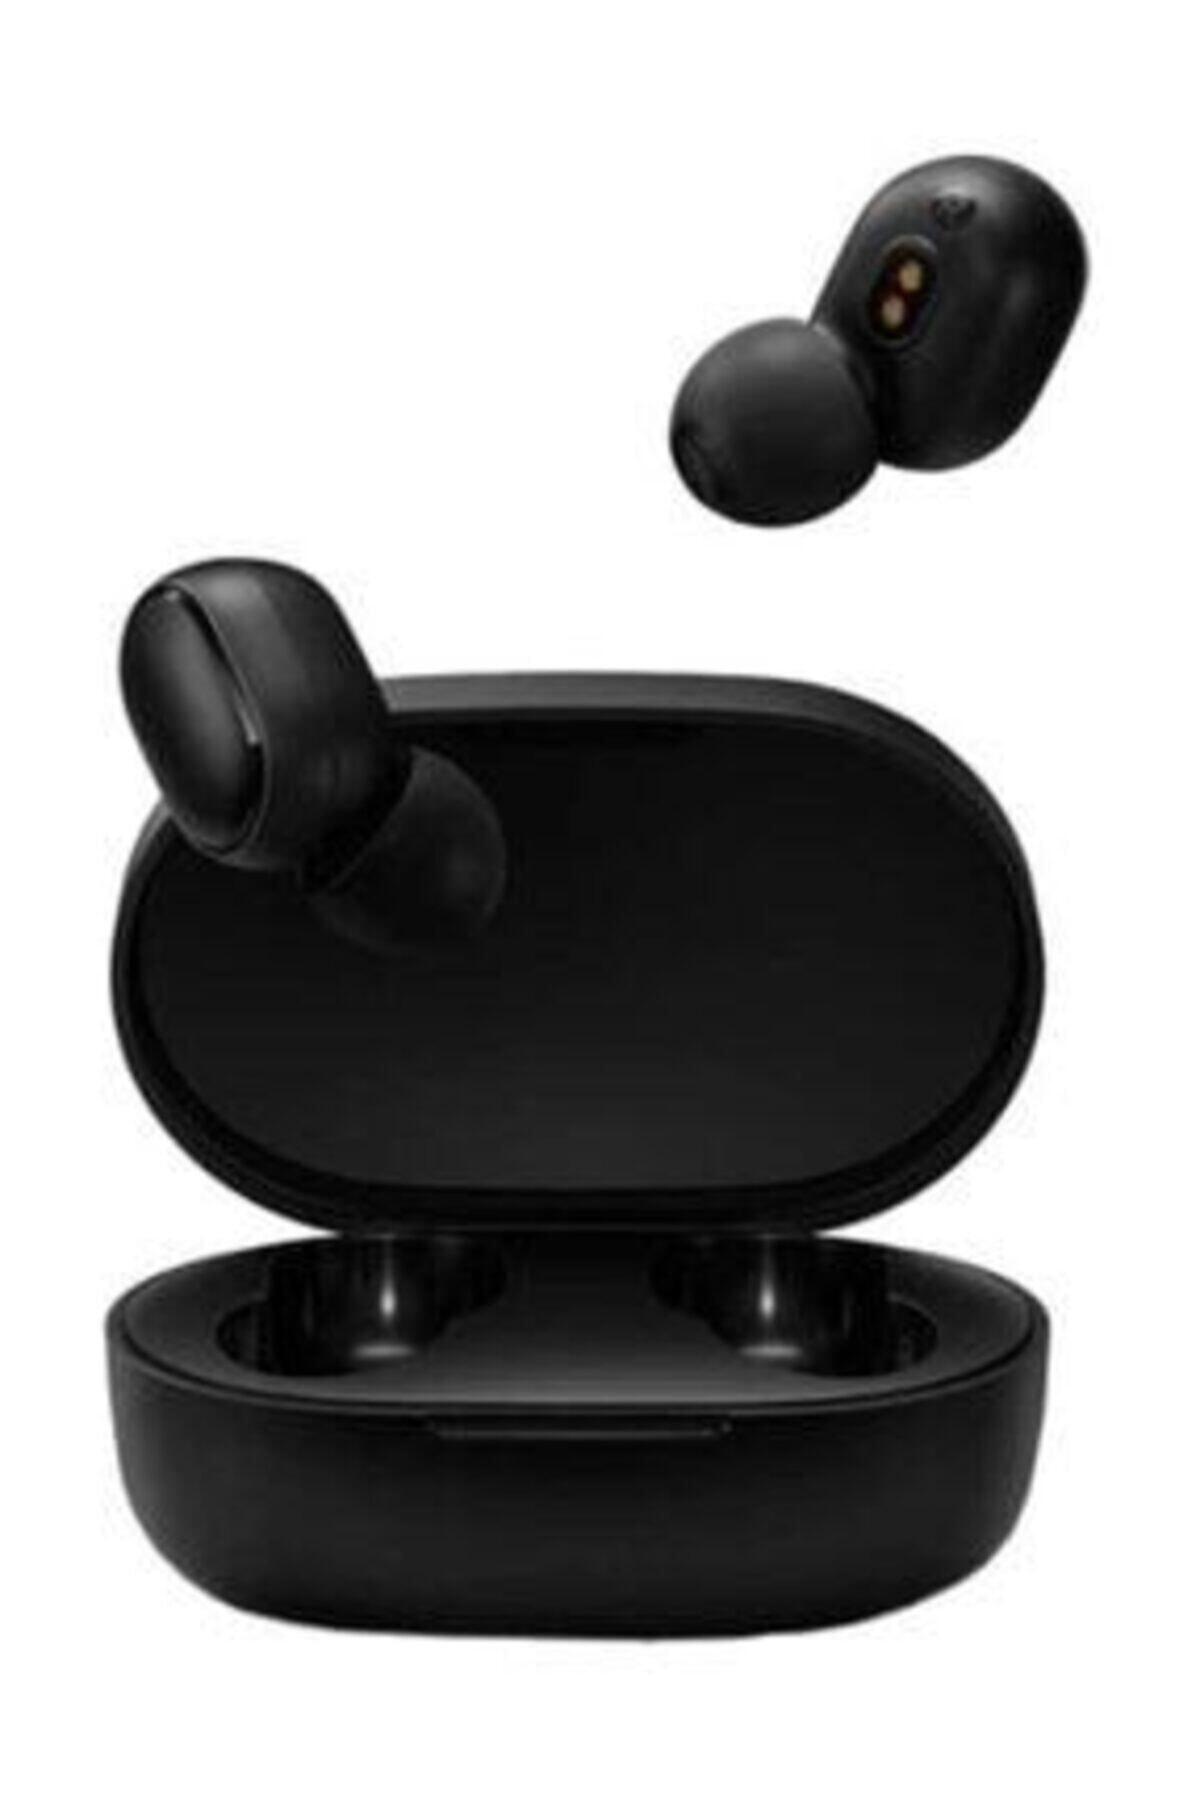 ttmobile Xiaomi Redmi Airdots Basic 2 Tws Bluetooth 5.0 Kulaklık 1